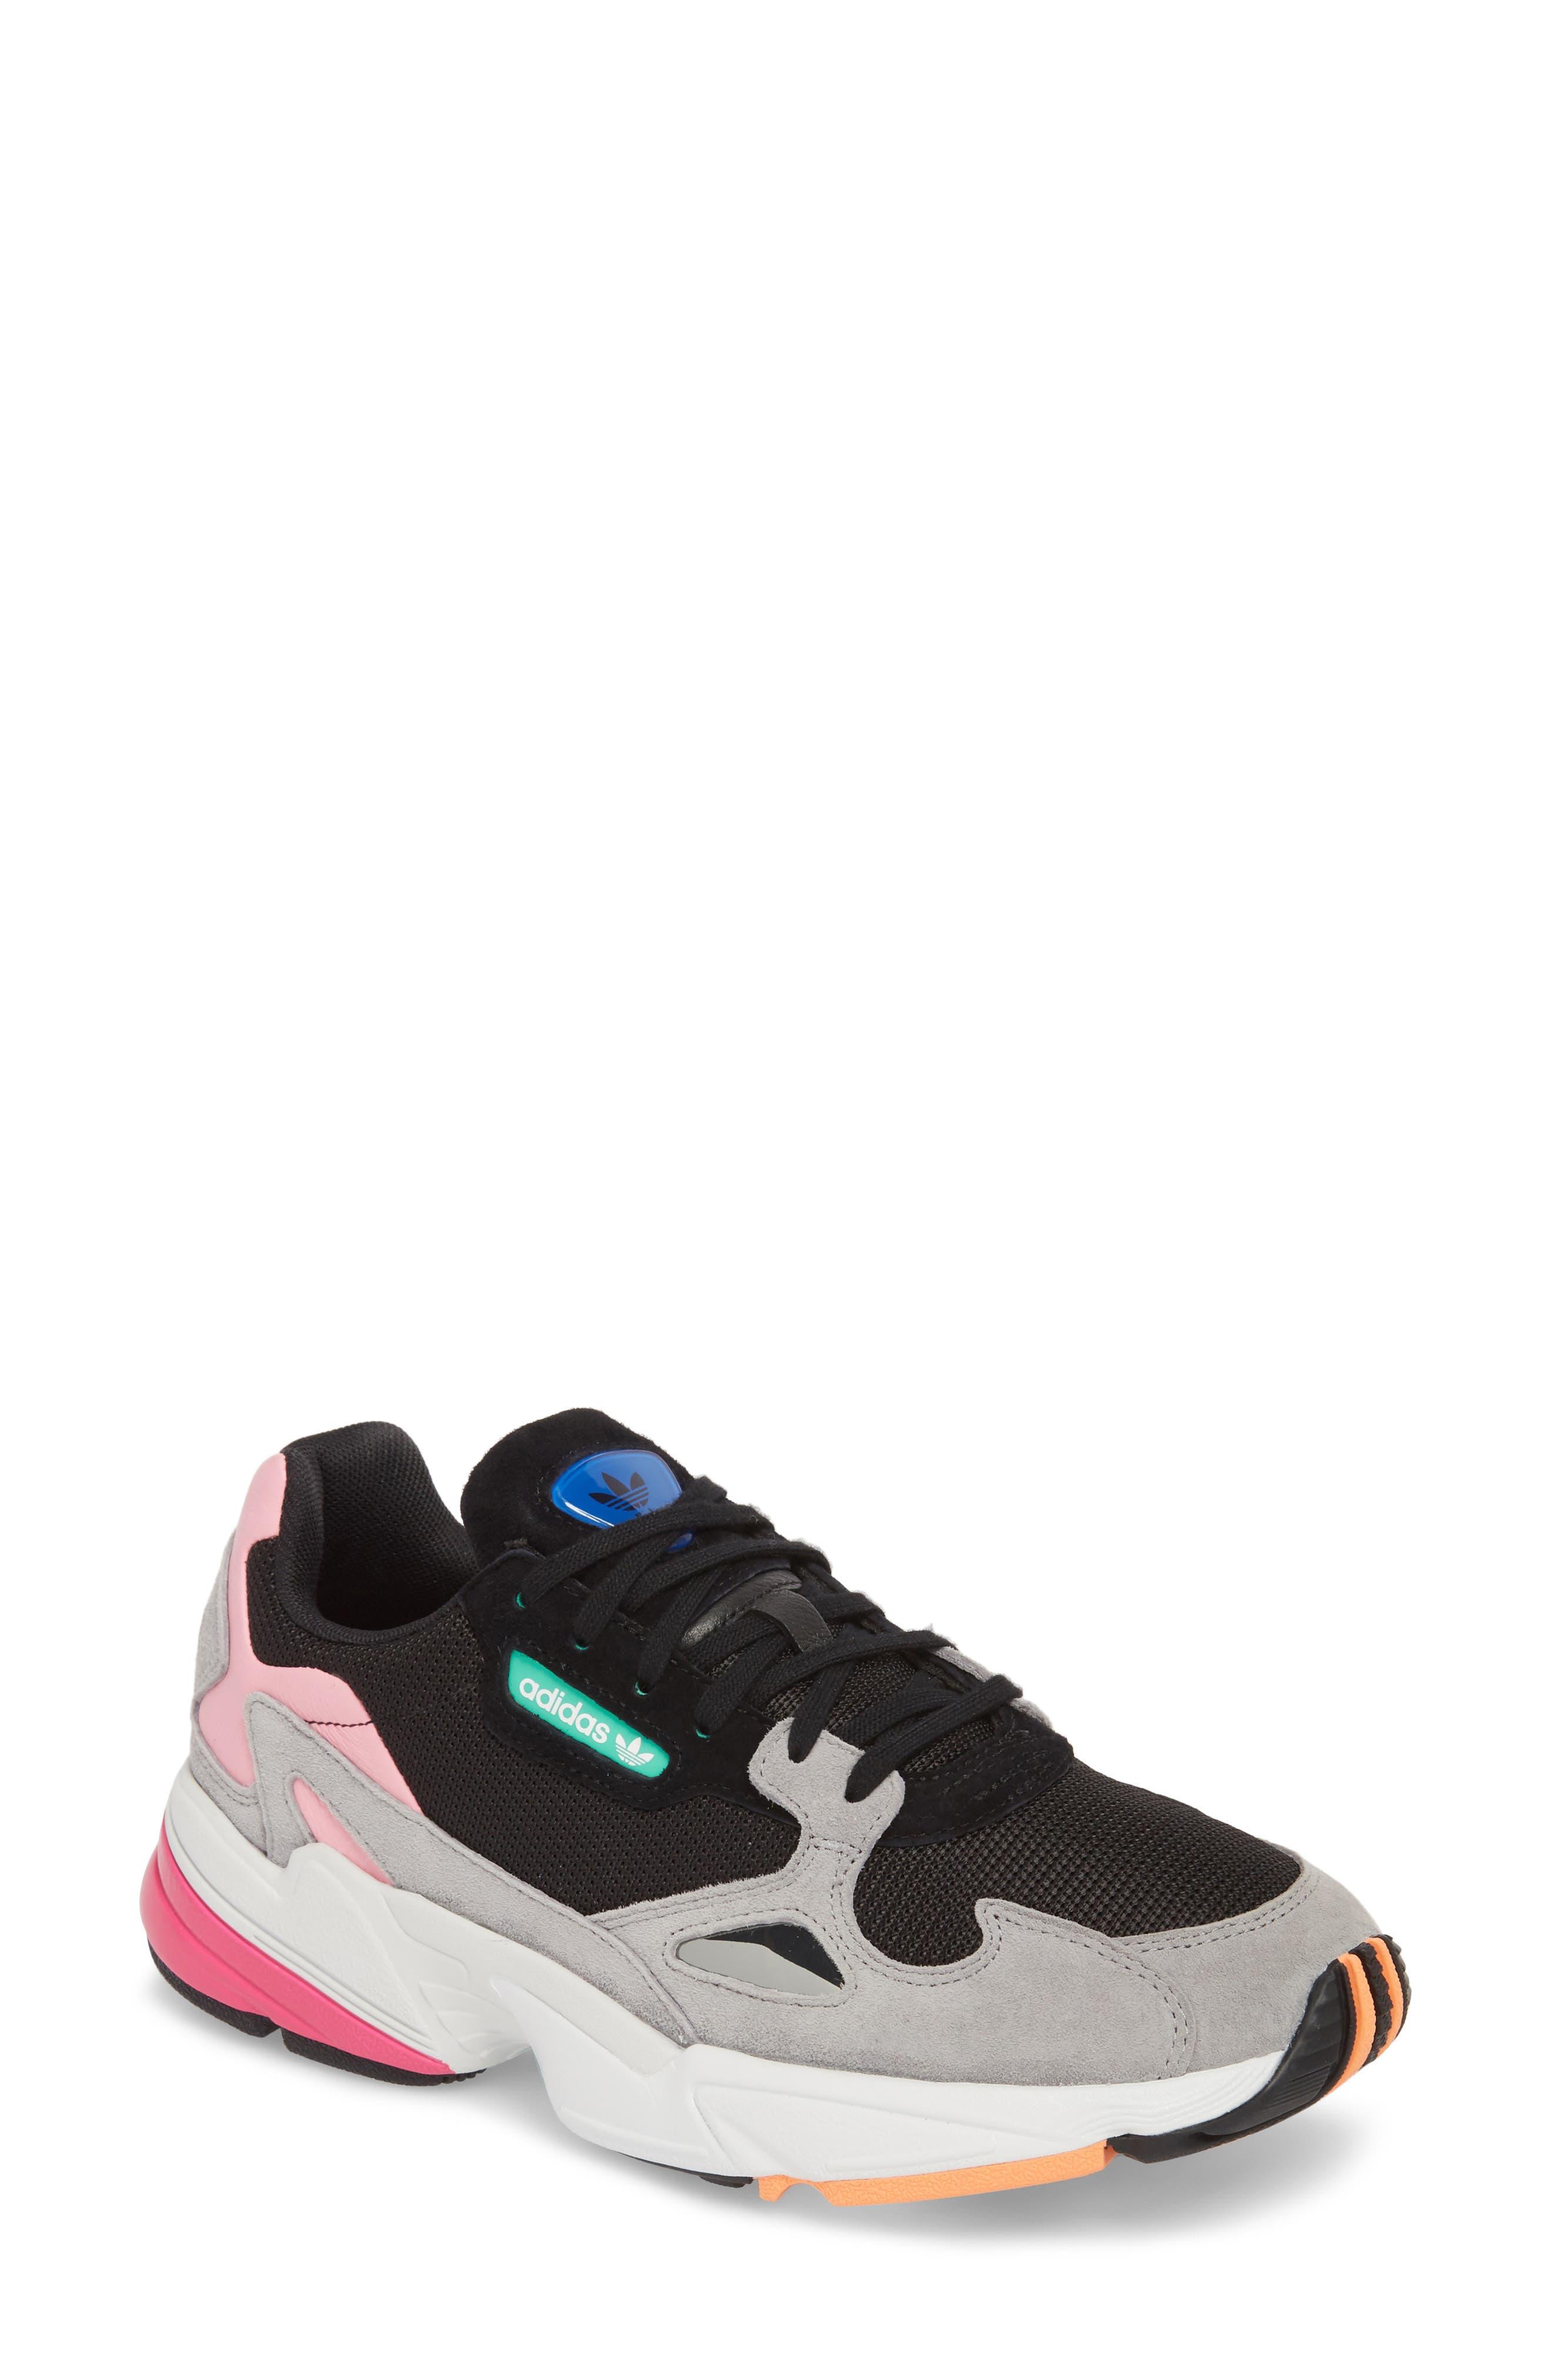 adidas Falcon Sneaker (Women)